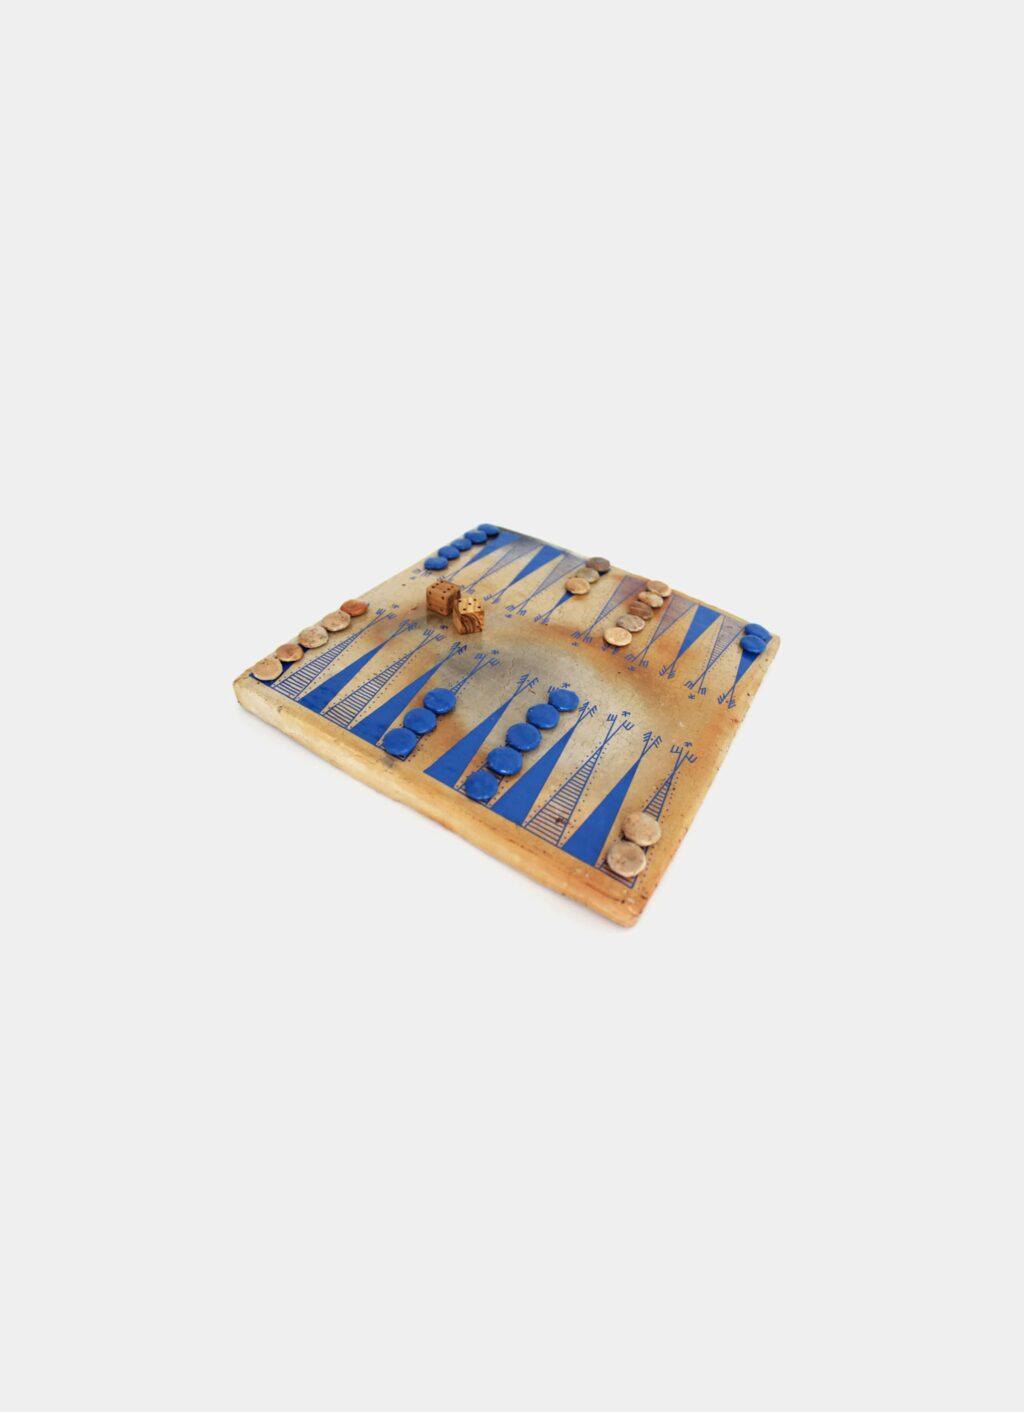 Flayou - Chich-Bich - Stoneware Backgammon - Special Edition - Neon blue